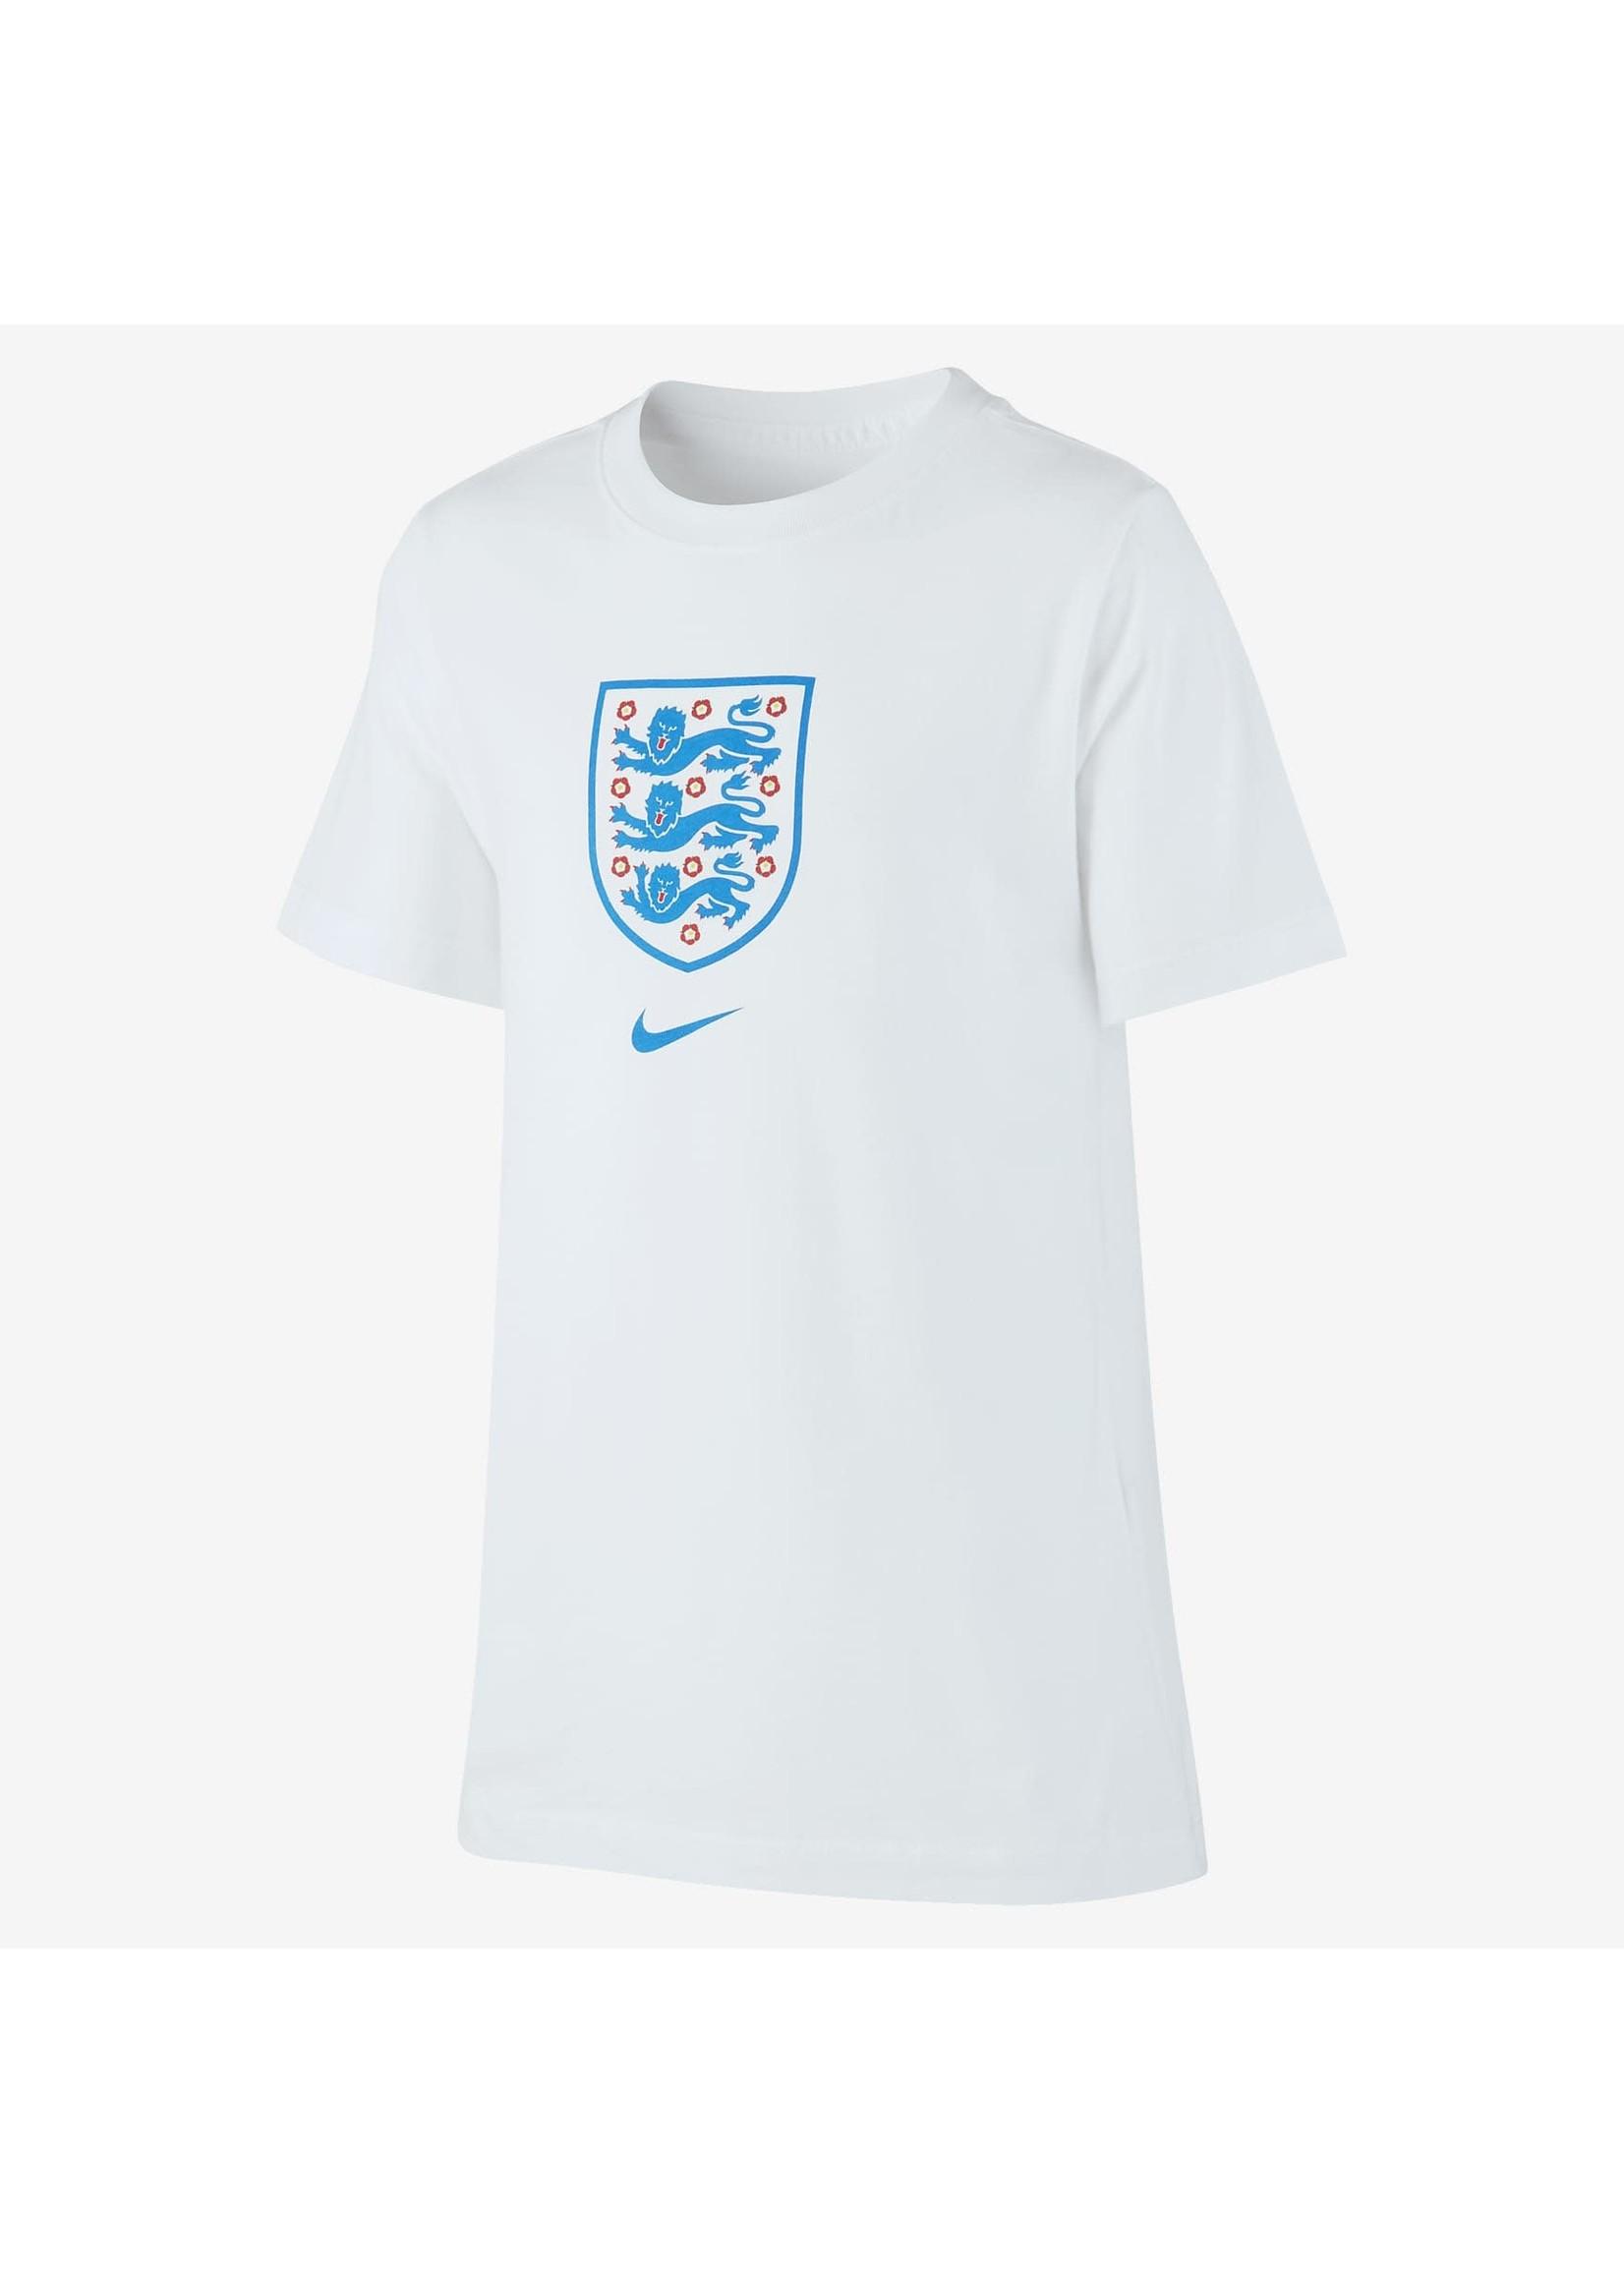 Nike England T-Shirt - CD1486-100